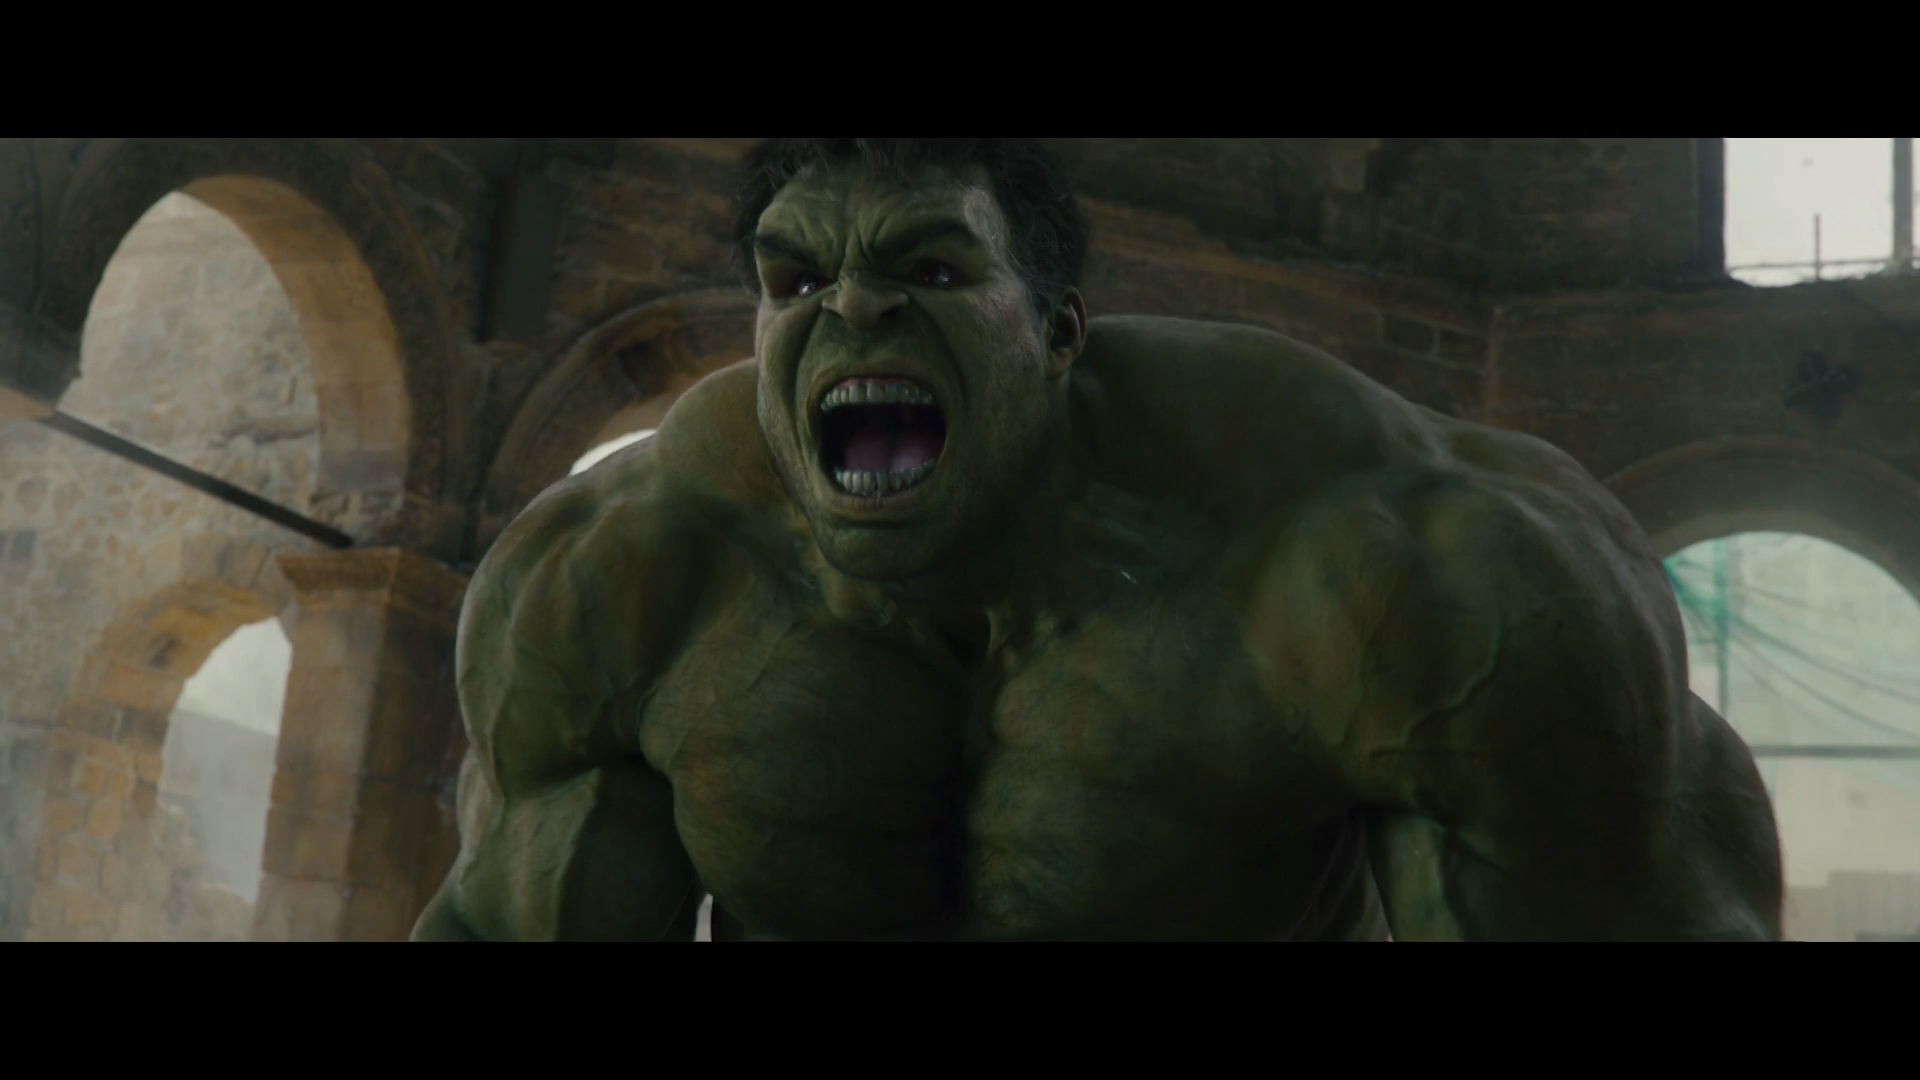 Avengers: Age of Ultron coming soon to Blu-ray, Digital HD & Disney Movies Anywhere